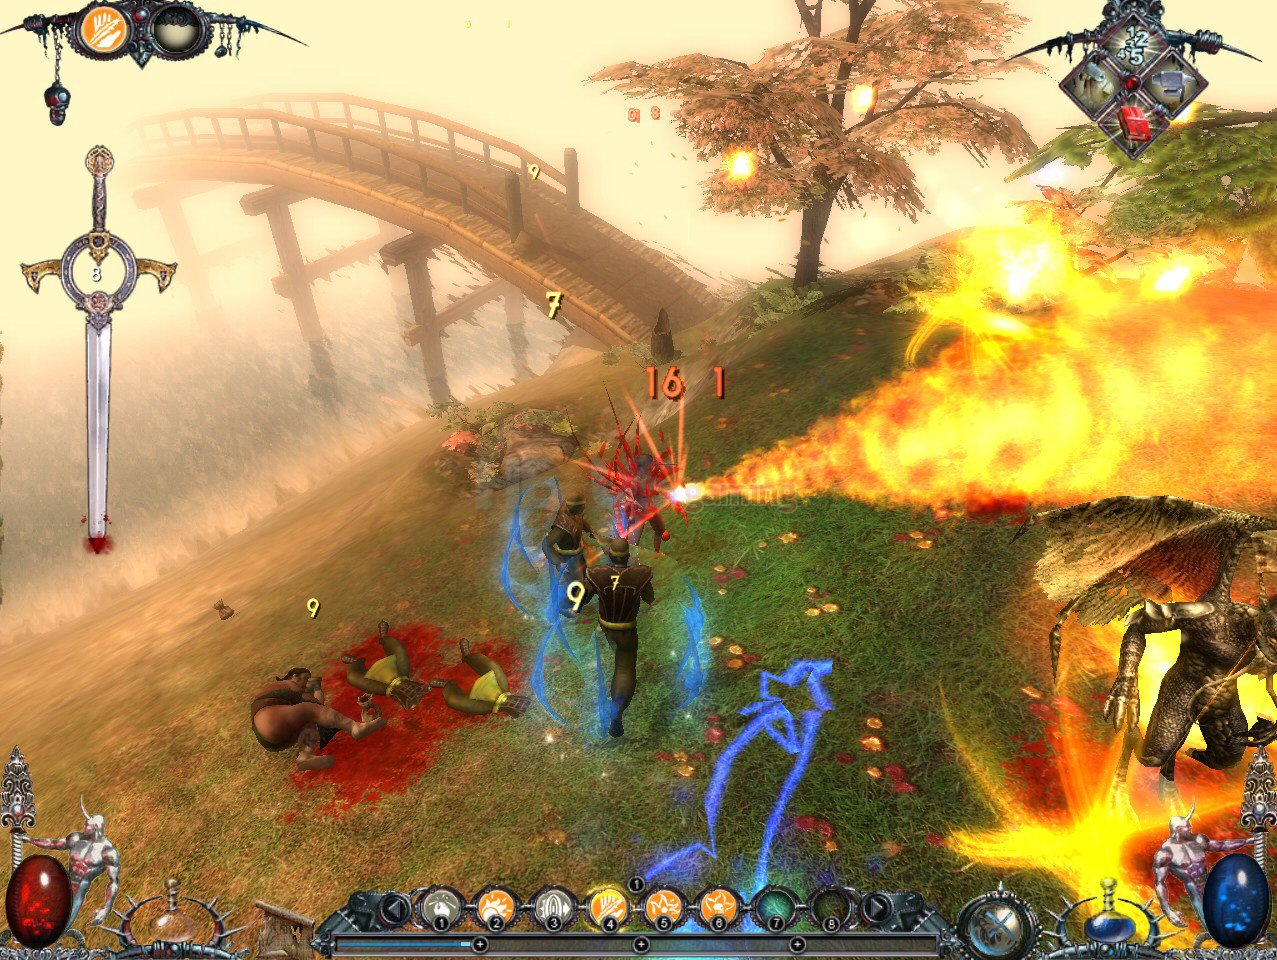 Dawn of magic 2 free full version games download games pc games